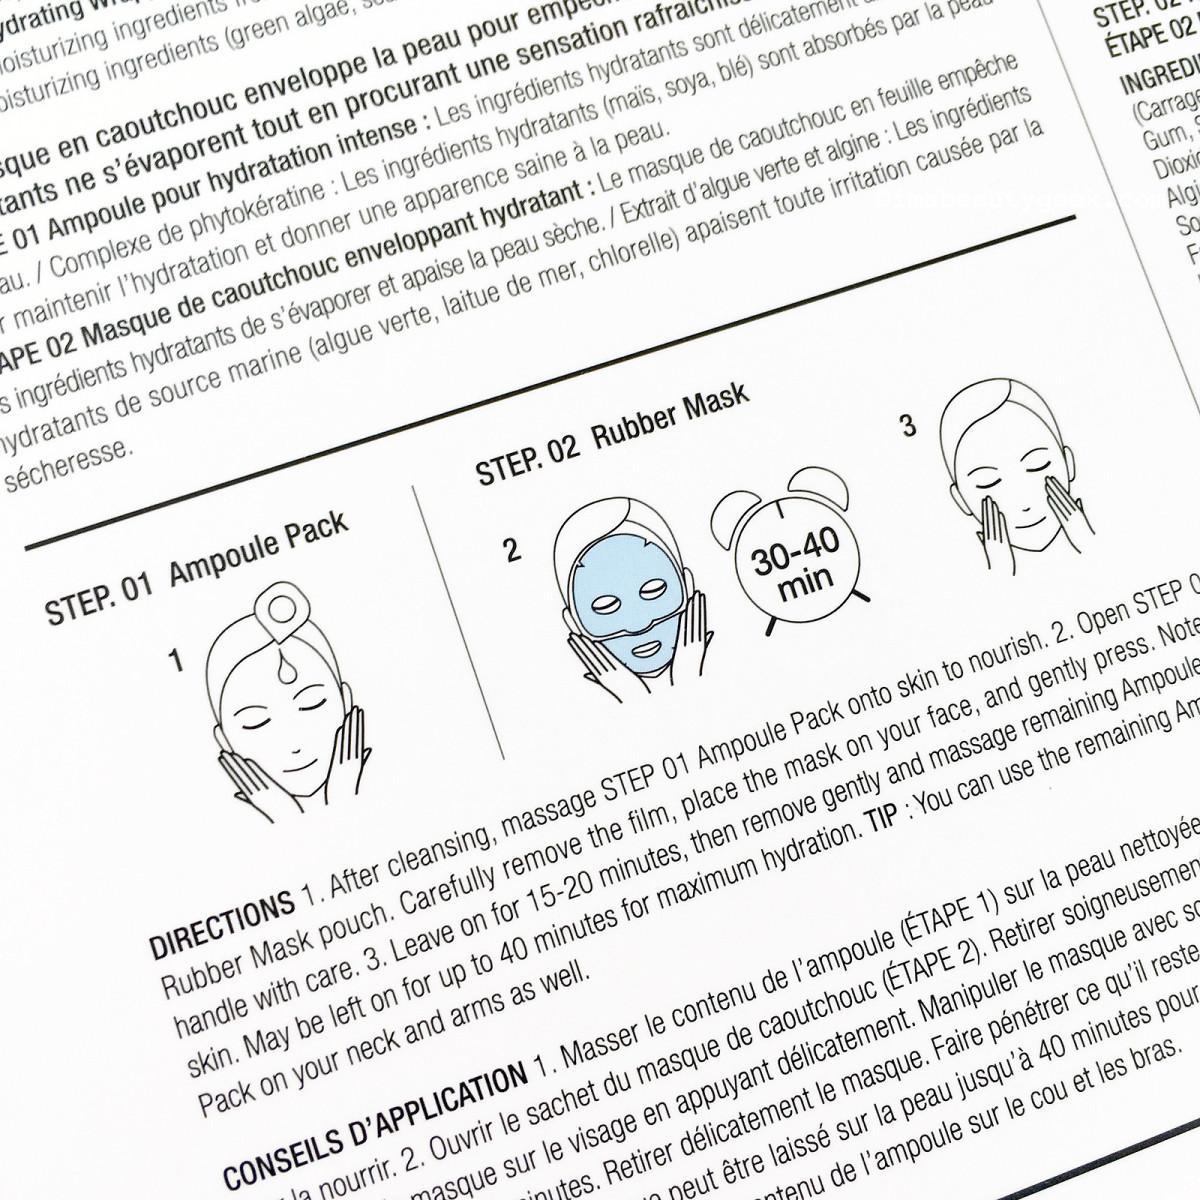 Dr. Jart Hydration Lover Rubber Mask directions